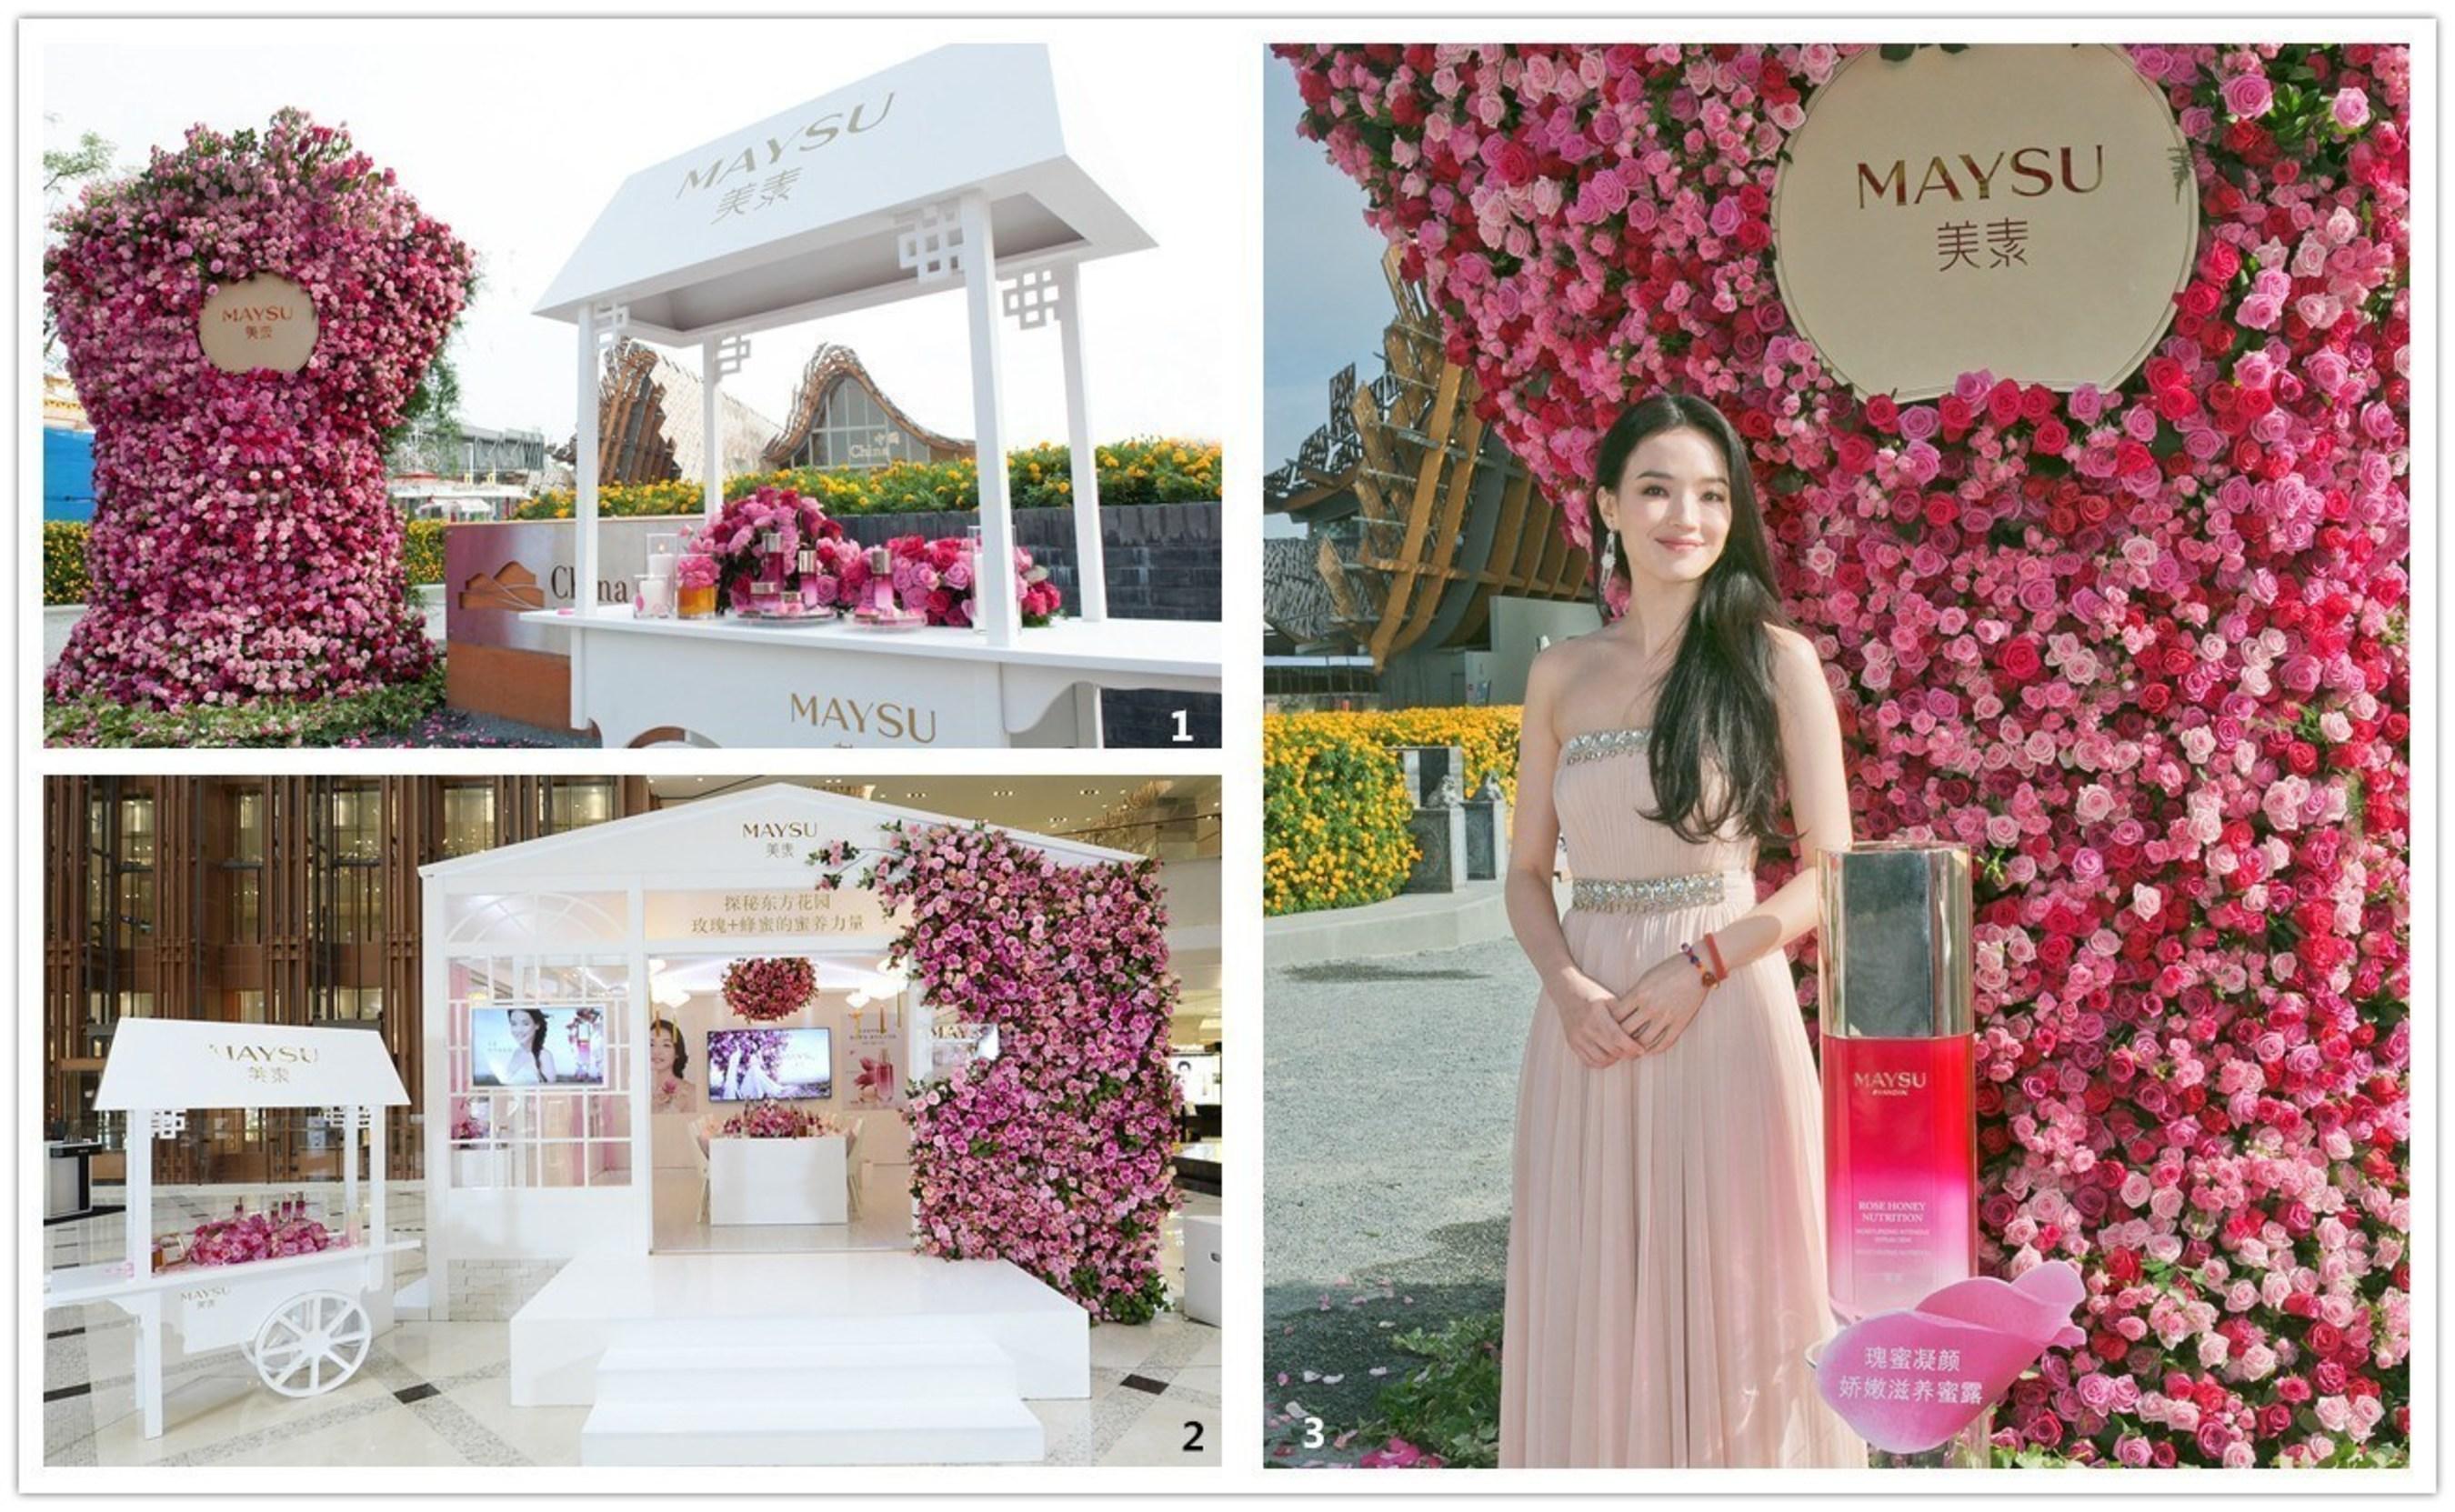 Photos 1 & 2: MAYSU spokesperson Shu Qi inaugurated the world premiere of Rose Honey Nutrition Moisturizing ...